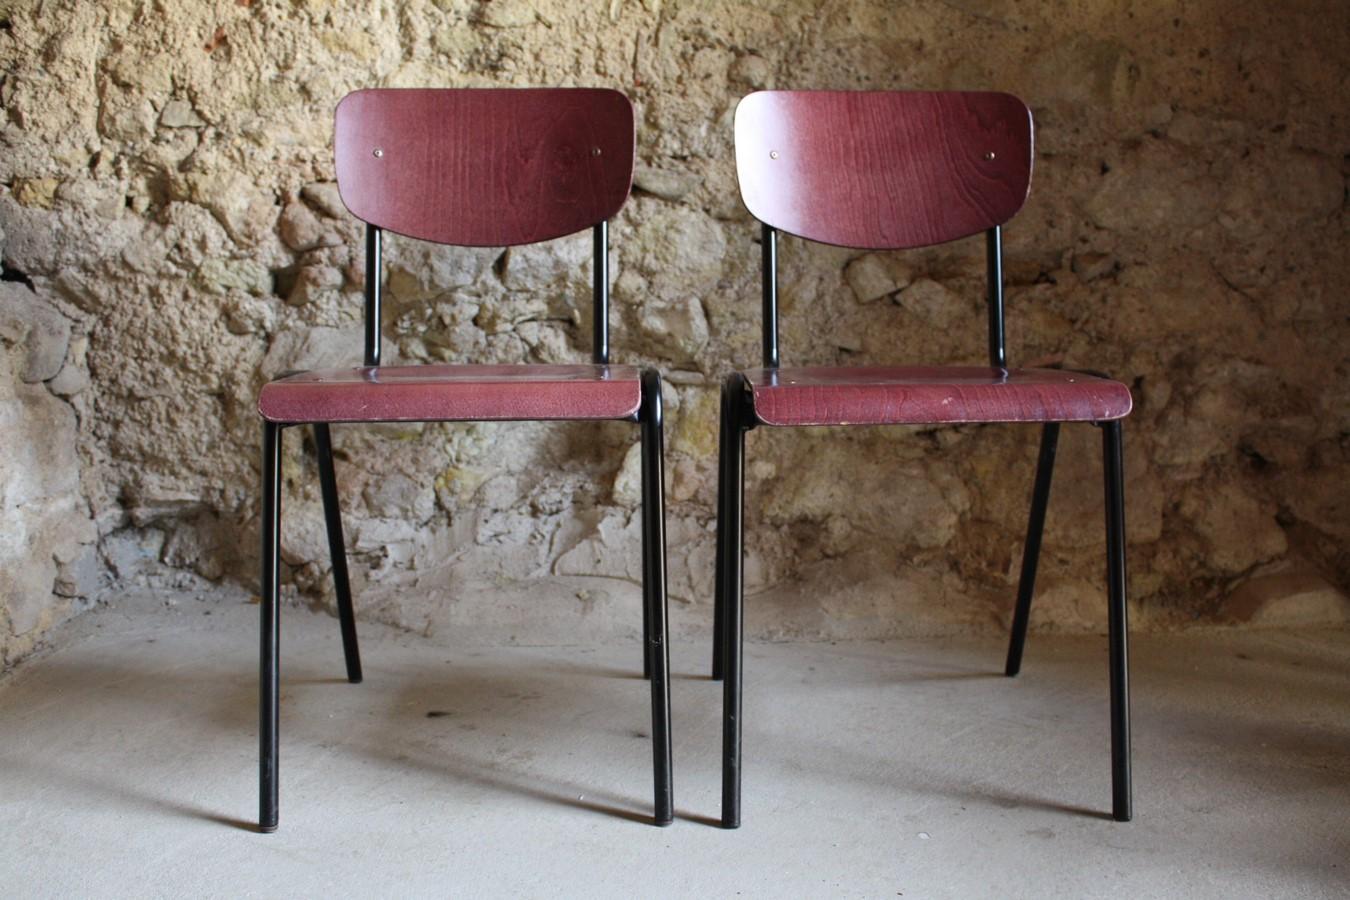 Schulstuhl stapelstuhl stahlrohr und holz 1 v 10 for Stuhl design schule